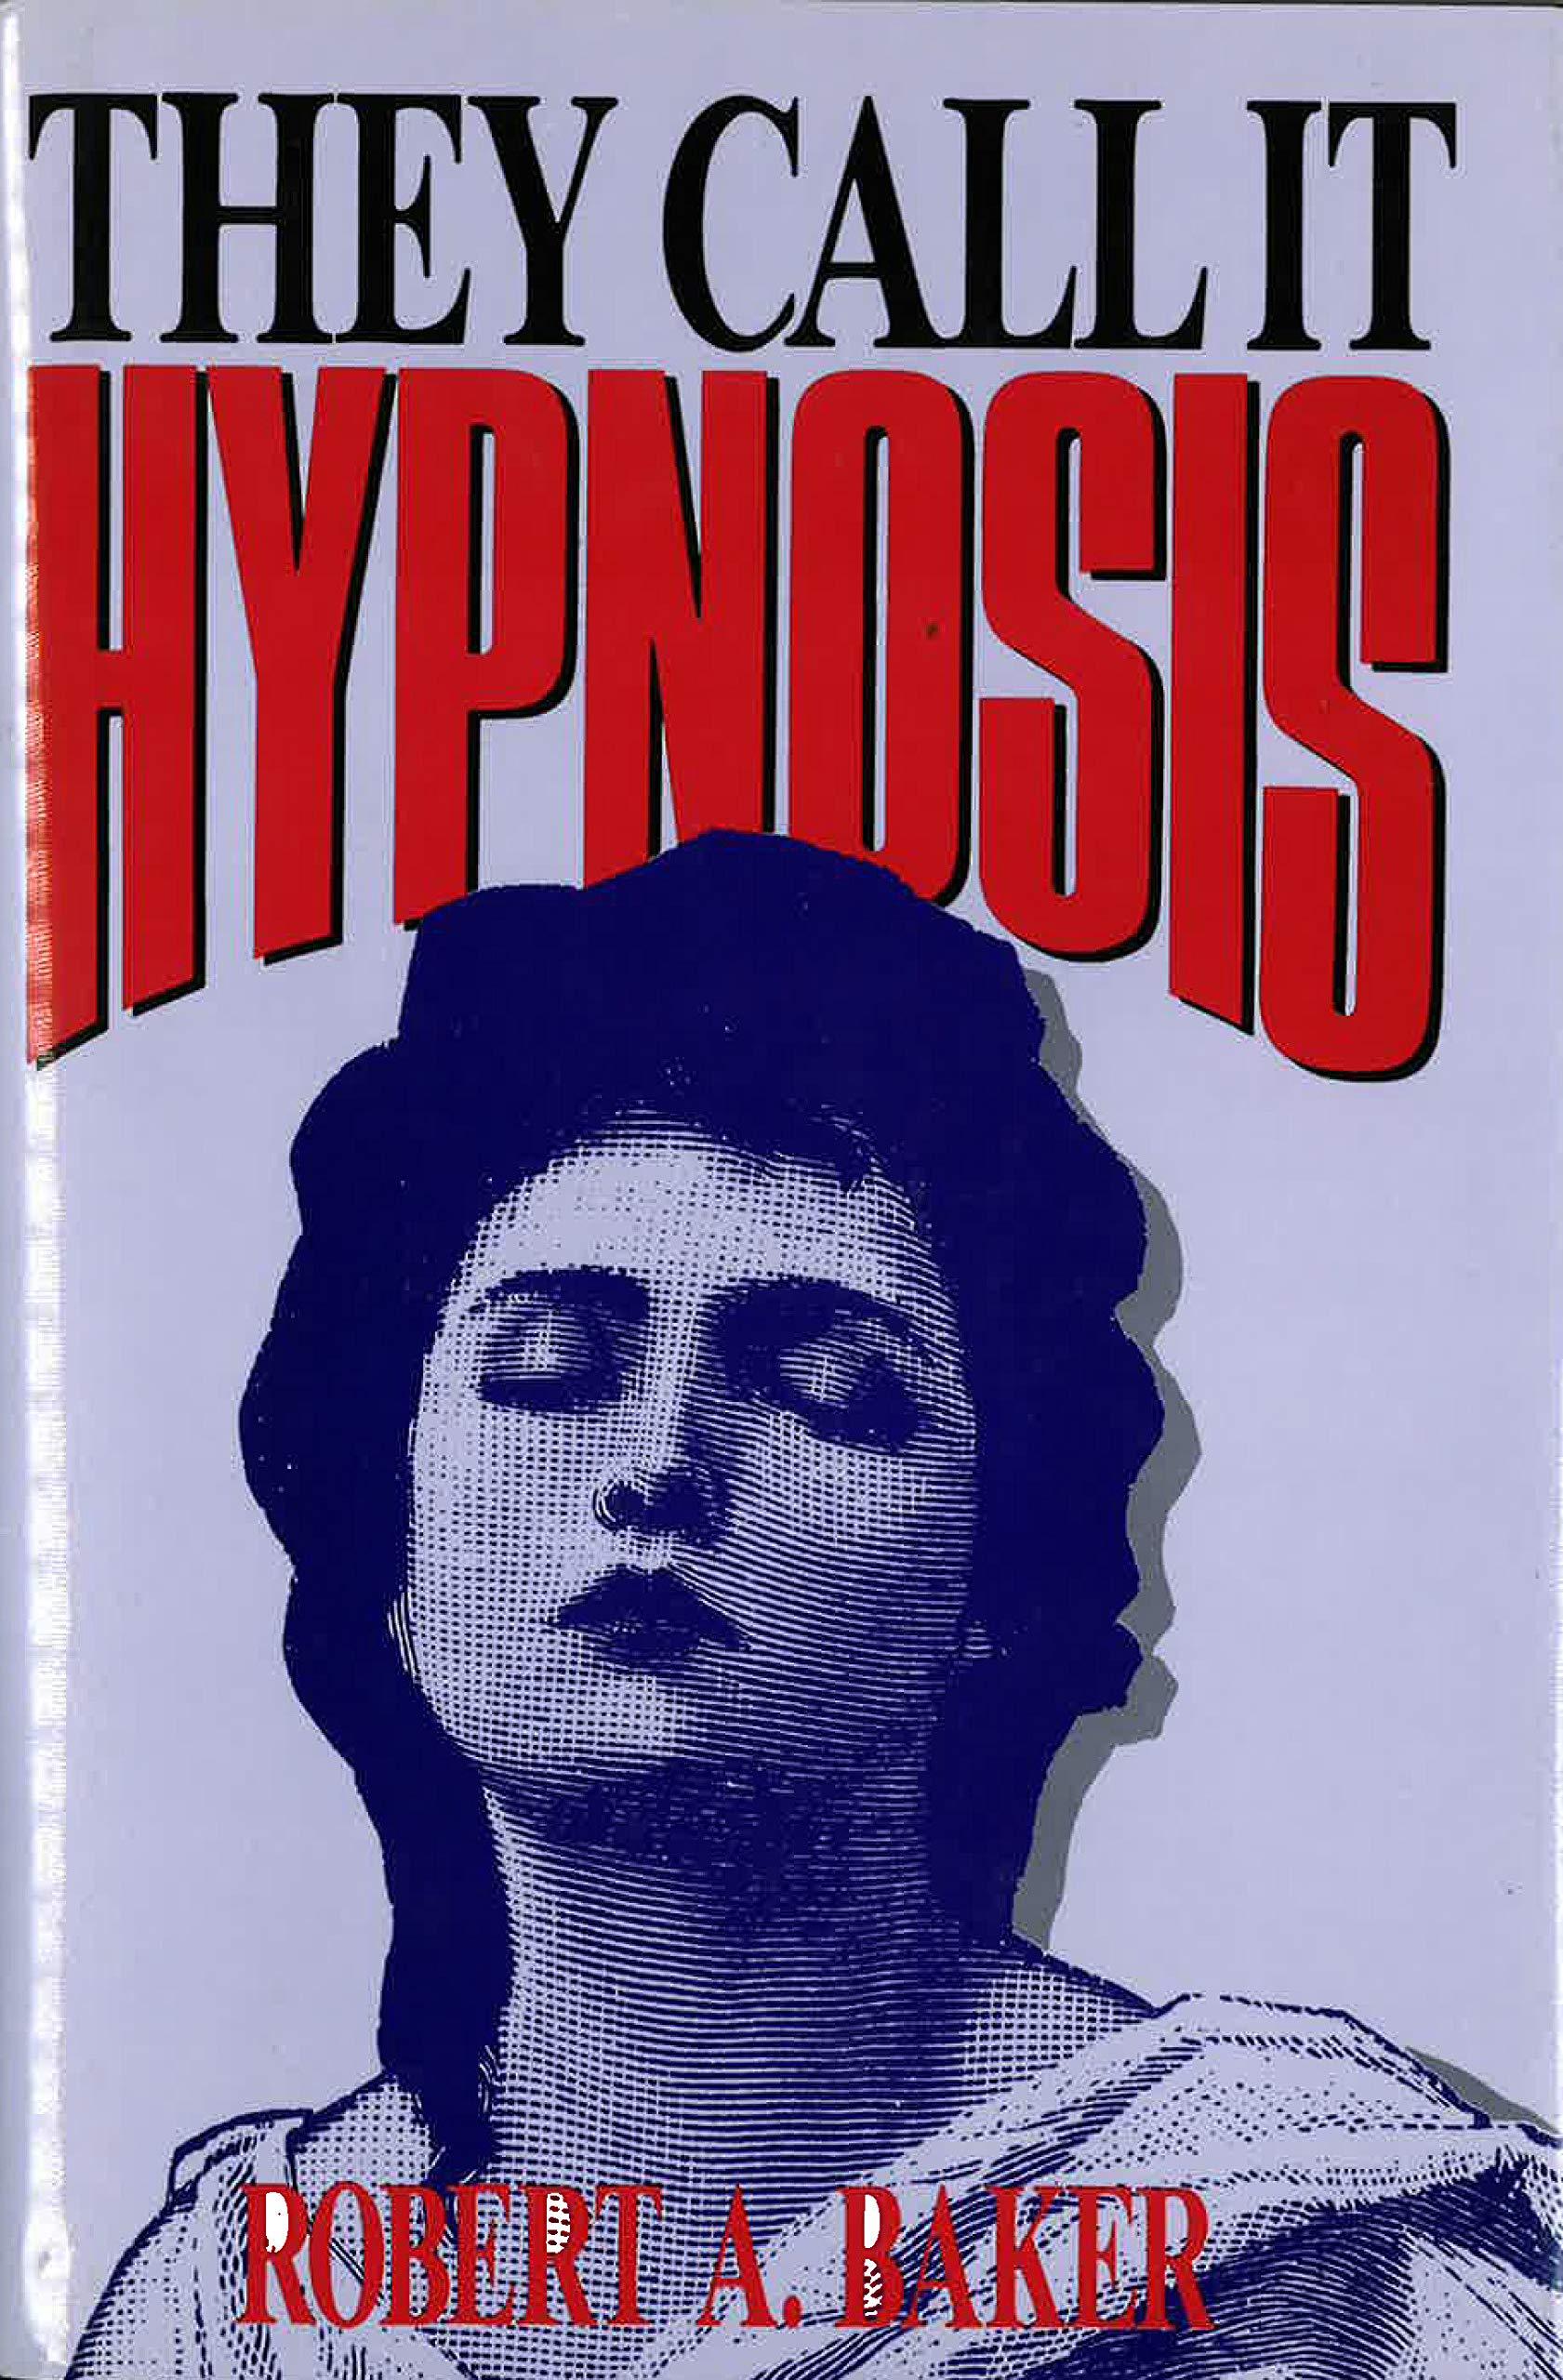 Girl hypnotized fantasy art consider, that